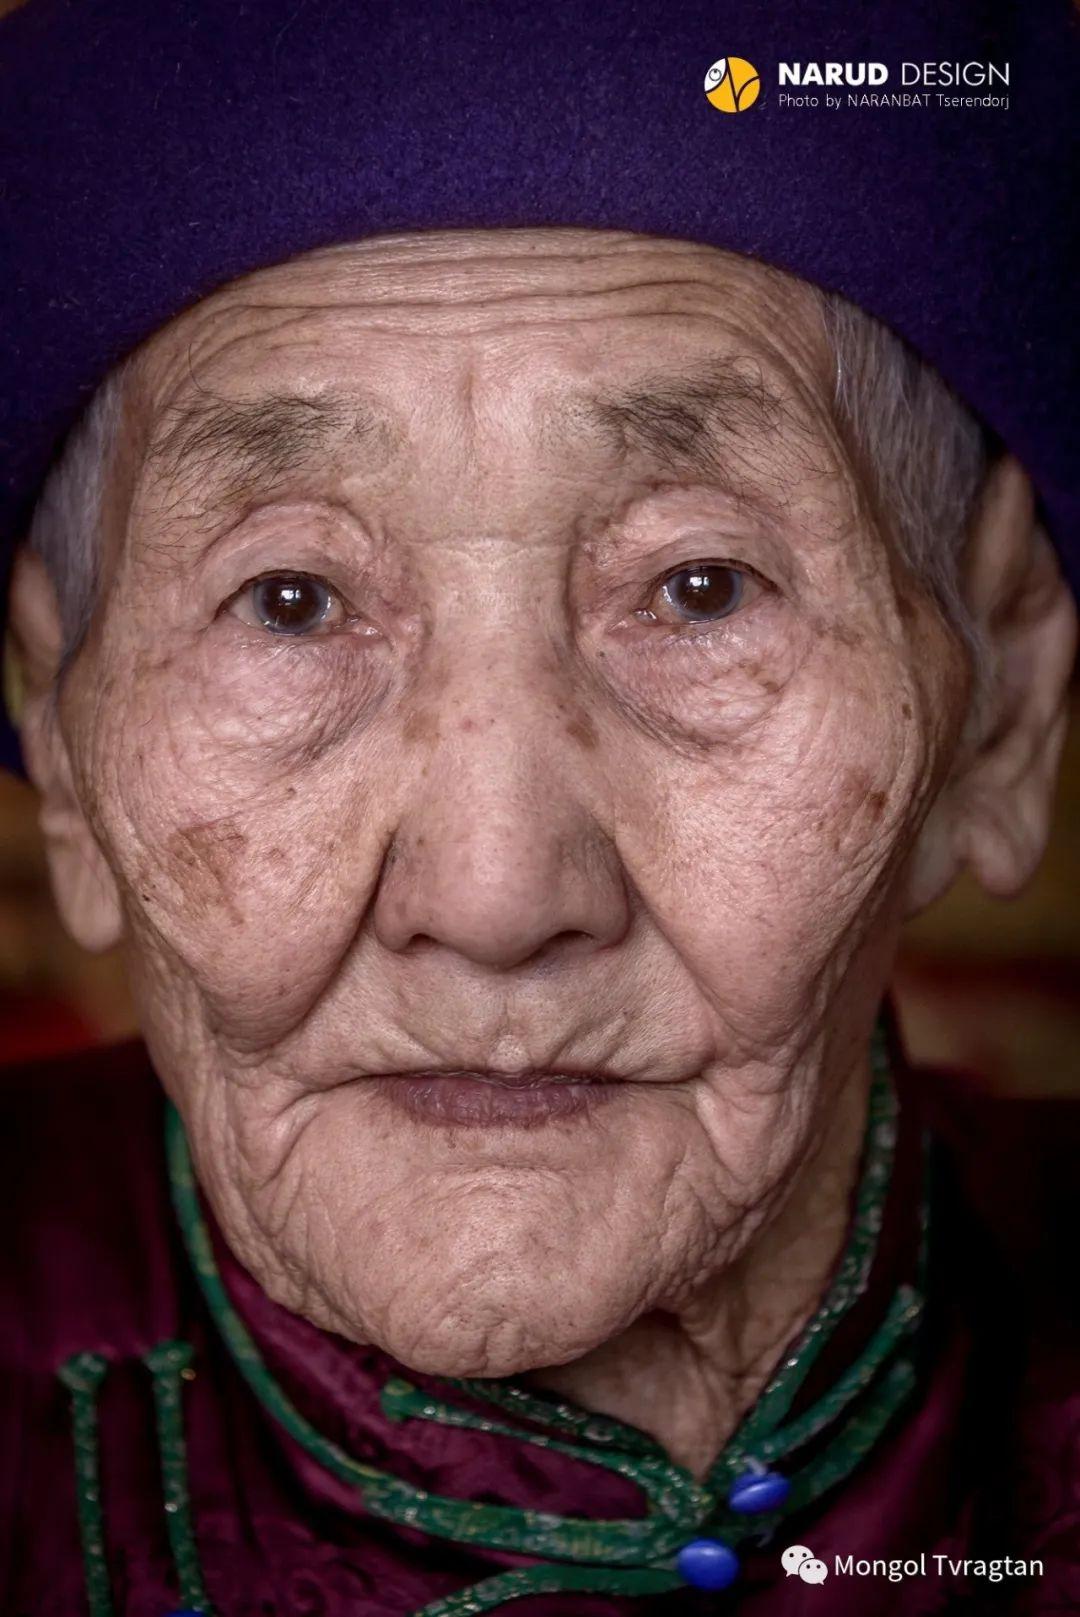 ᠮᠣᠩᠭᠤᠯ ᠰᠡᠭᠦᠳᠡᠷ- ᠴ᠂ ᠨᠠᠷᠠᠨᠪᠠᠲᠤ 第8张 ᠮᠣᠩᠭᠤᠯ ᠰᠡᠭᠦᠳᠡᠷ- ᠴ᠂ ᠨᠠᠷᠠᠨᠪᠠᠲᠤ 蒙古文化